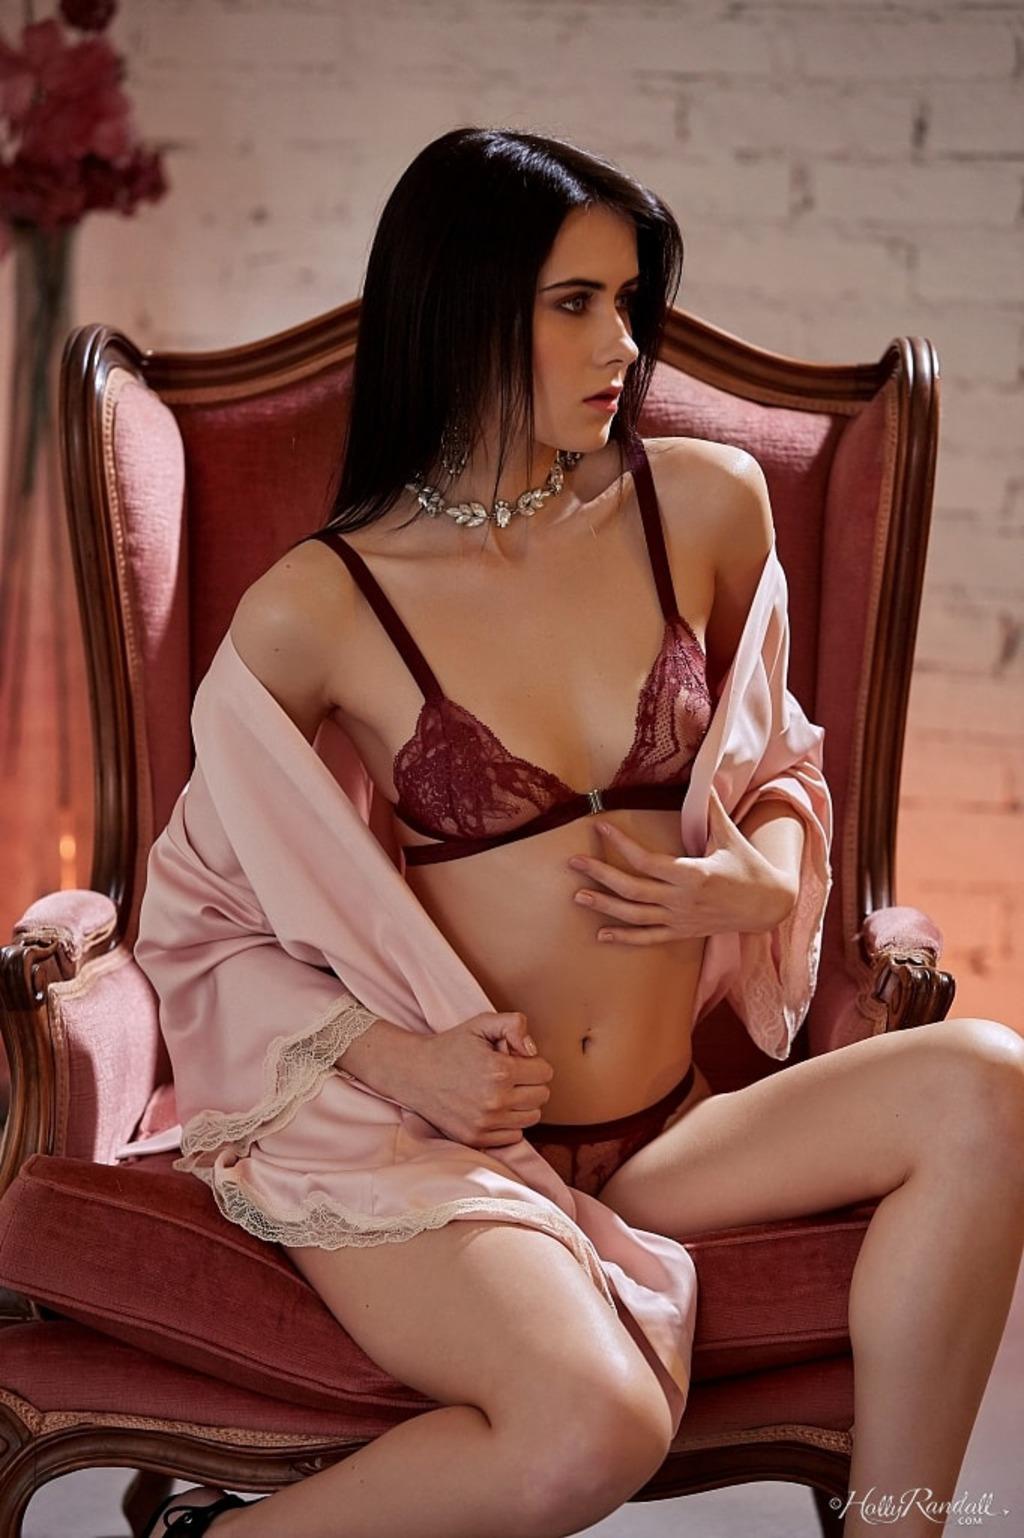 PHOTO | 00 39 - Sexy Model Mona Doing Her Best